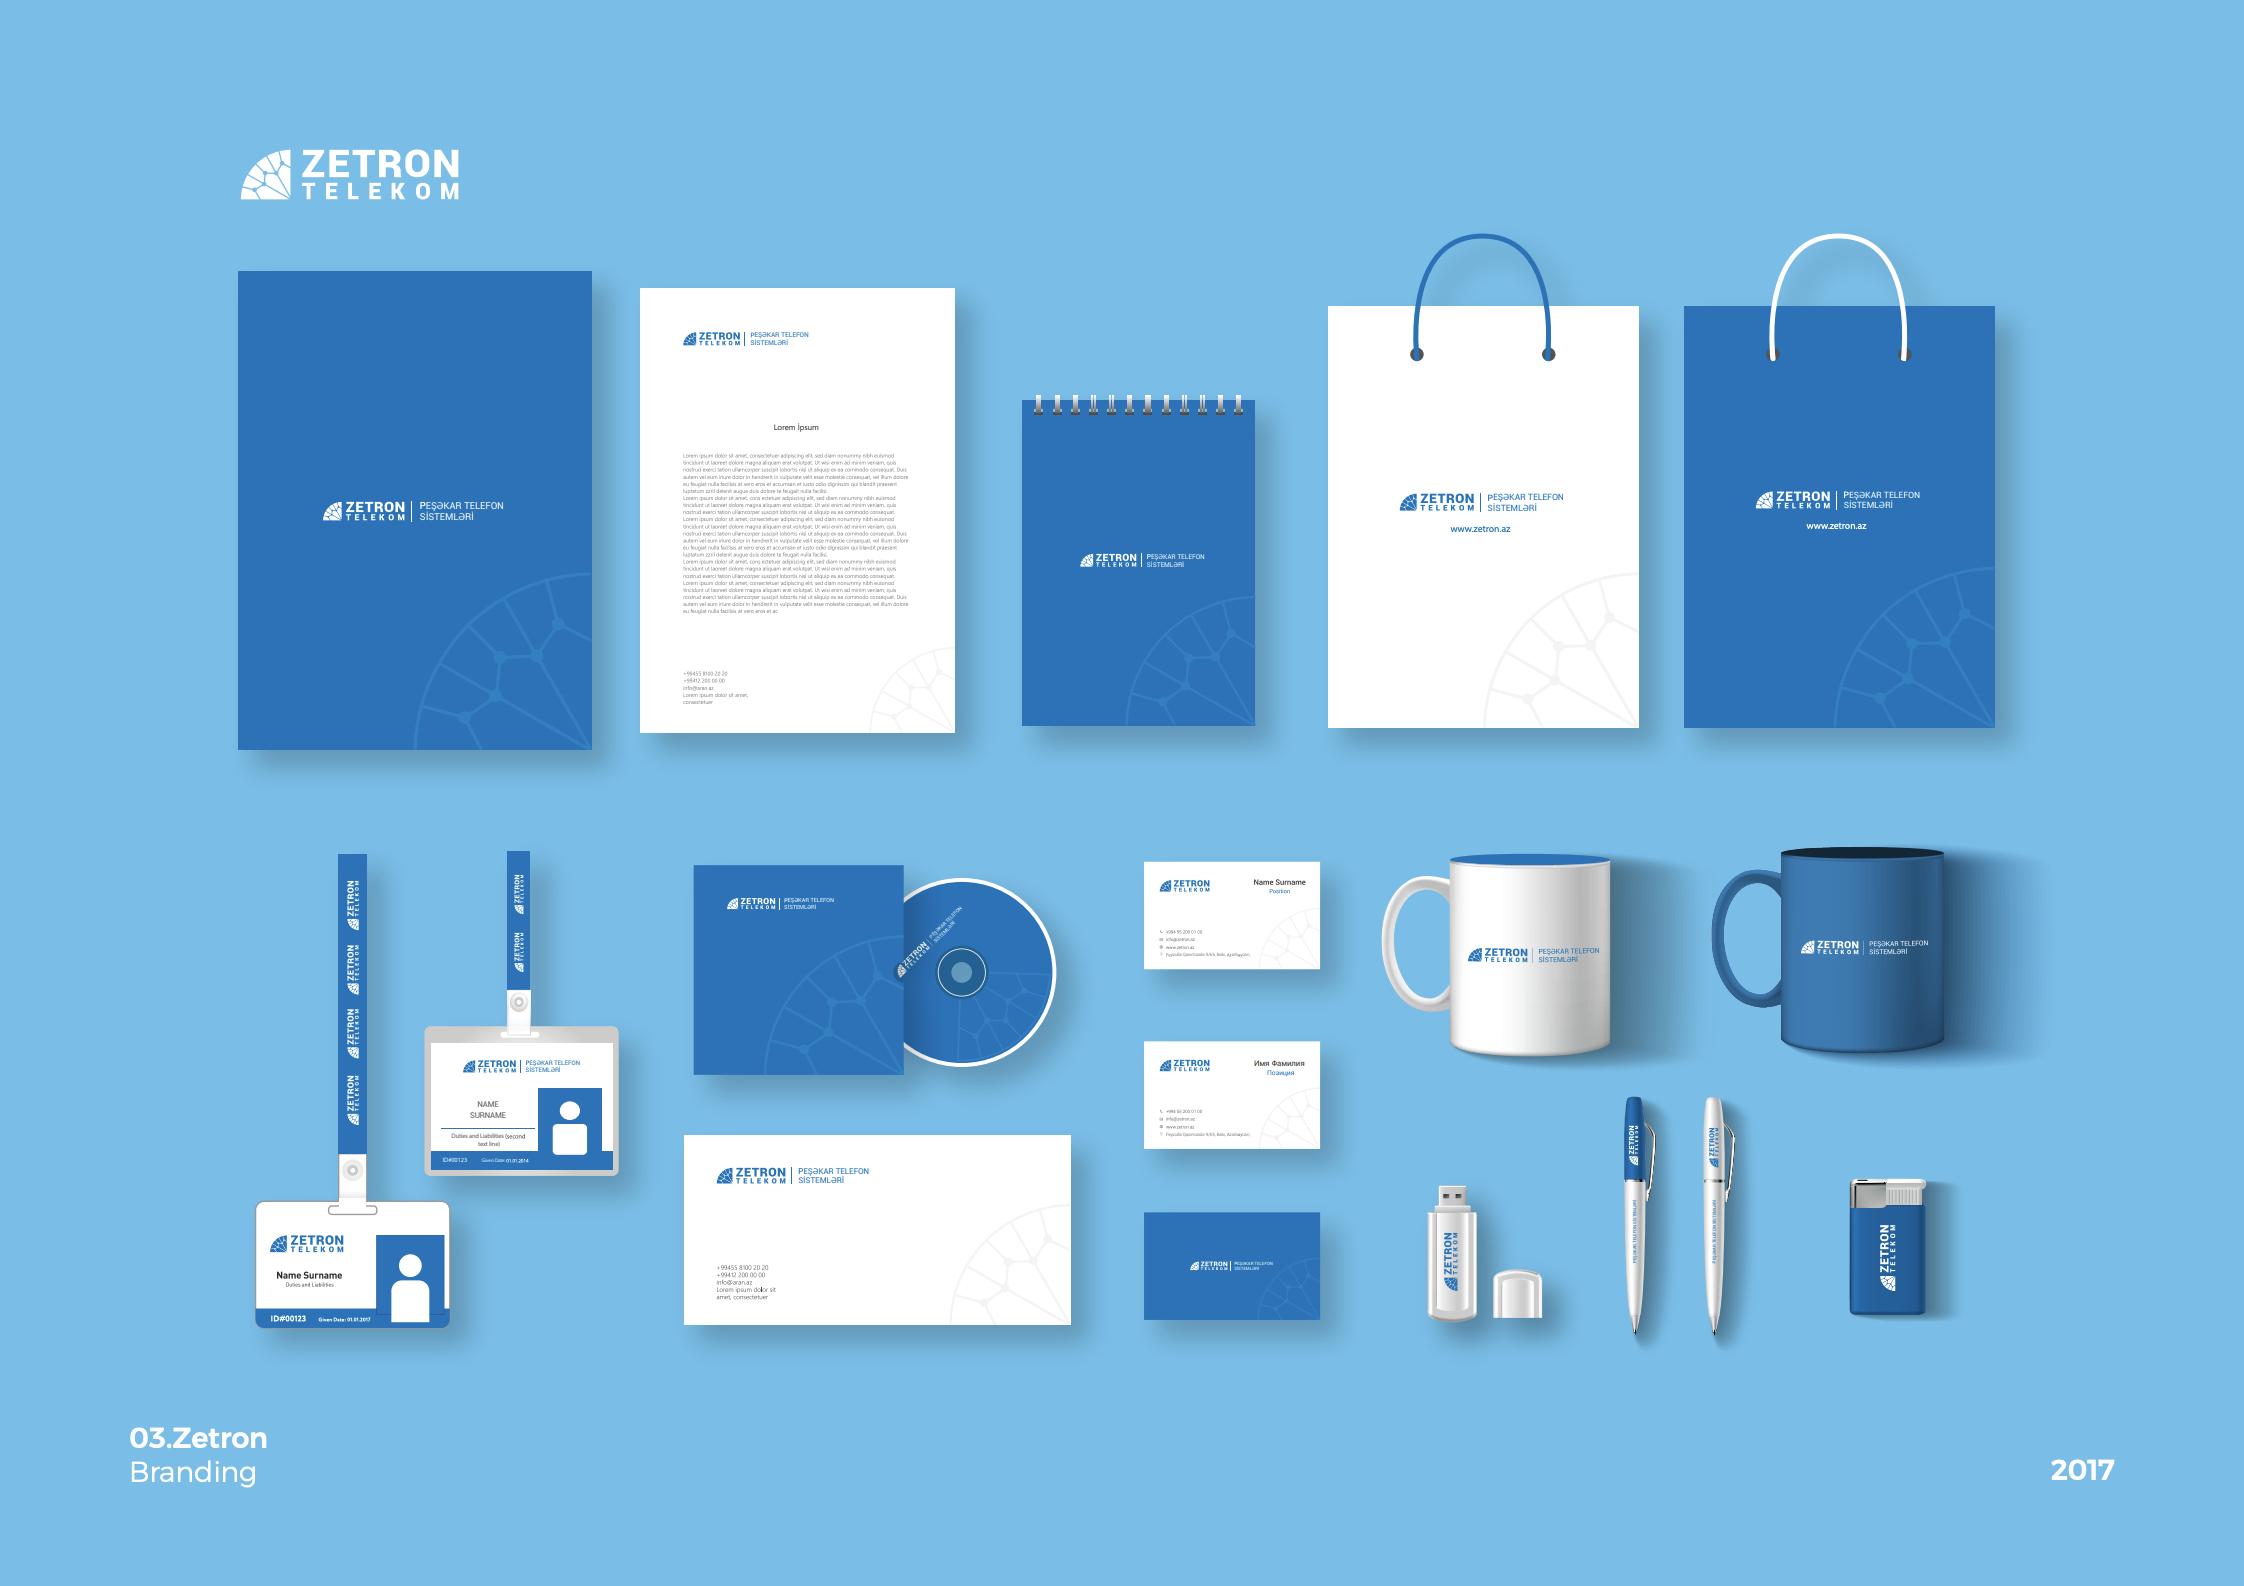 Branding image - 3